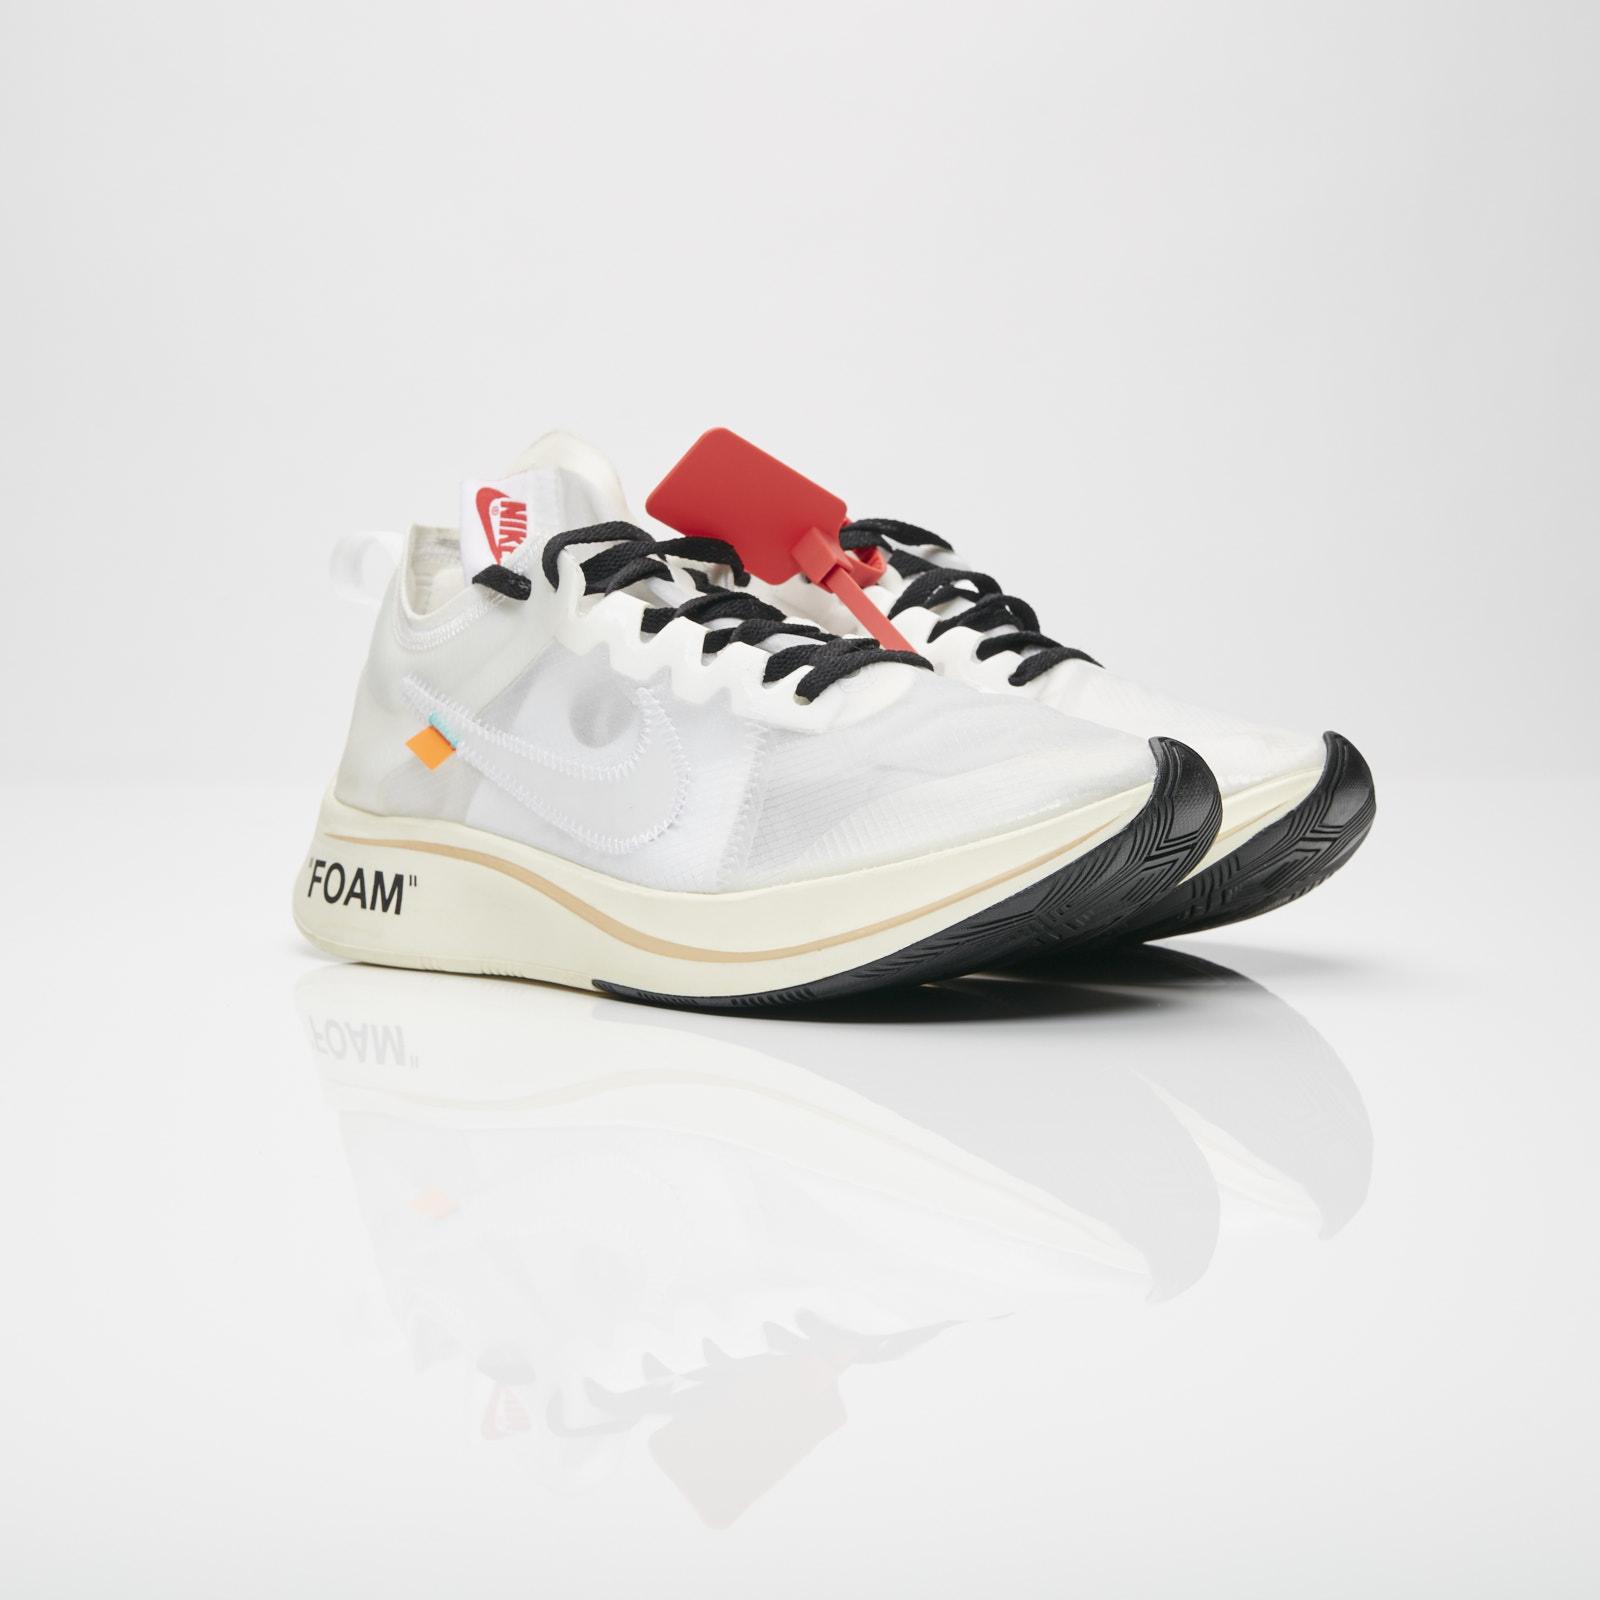 8d25a760ea1f7 Nike The 10  Zoom Fly - Aj4588-100 - Sneakersnstuff